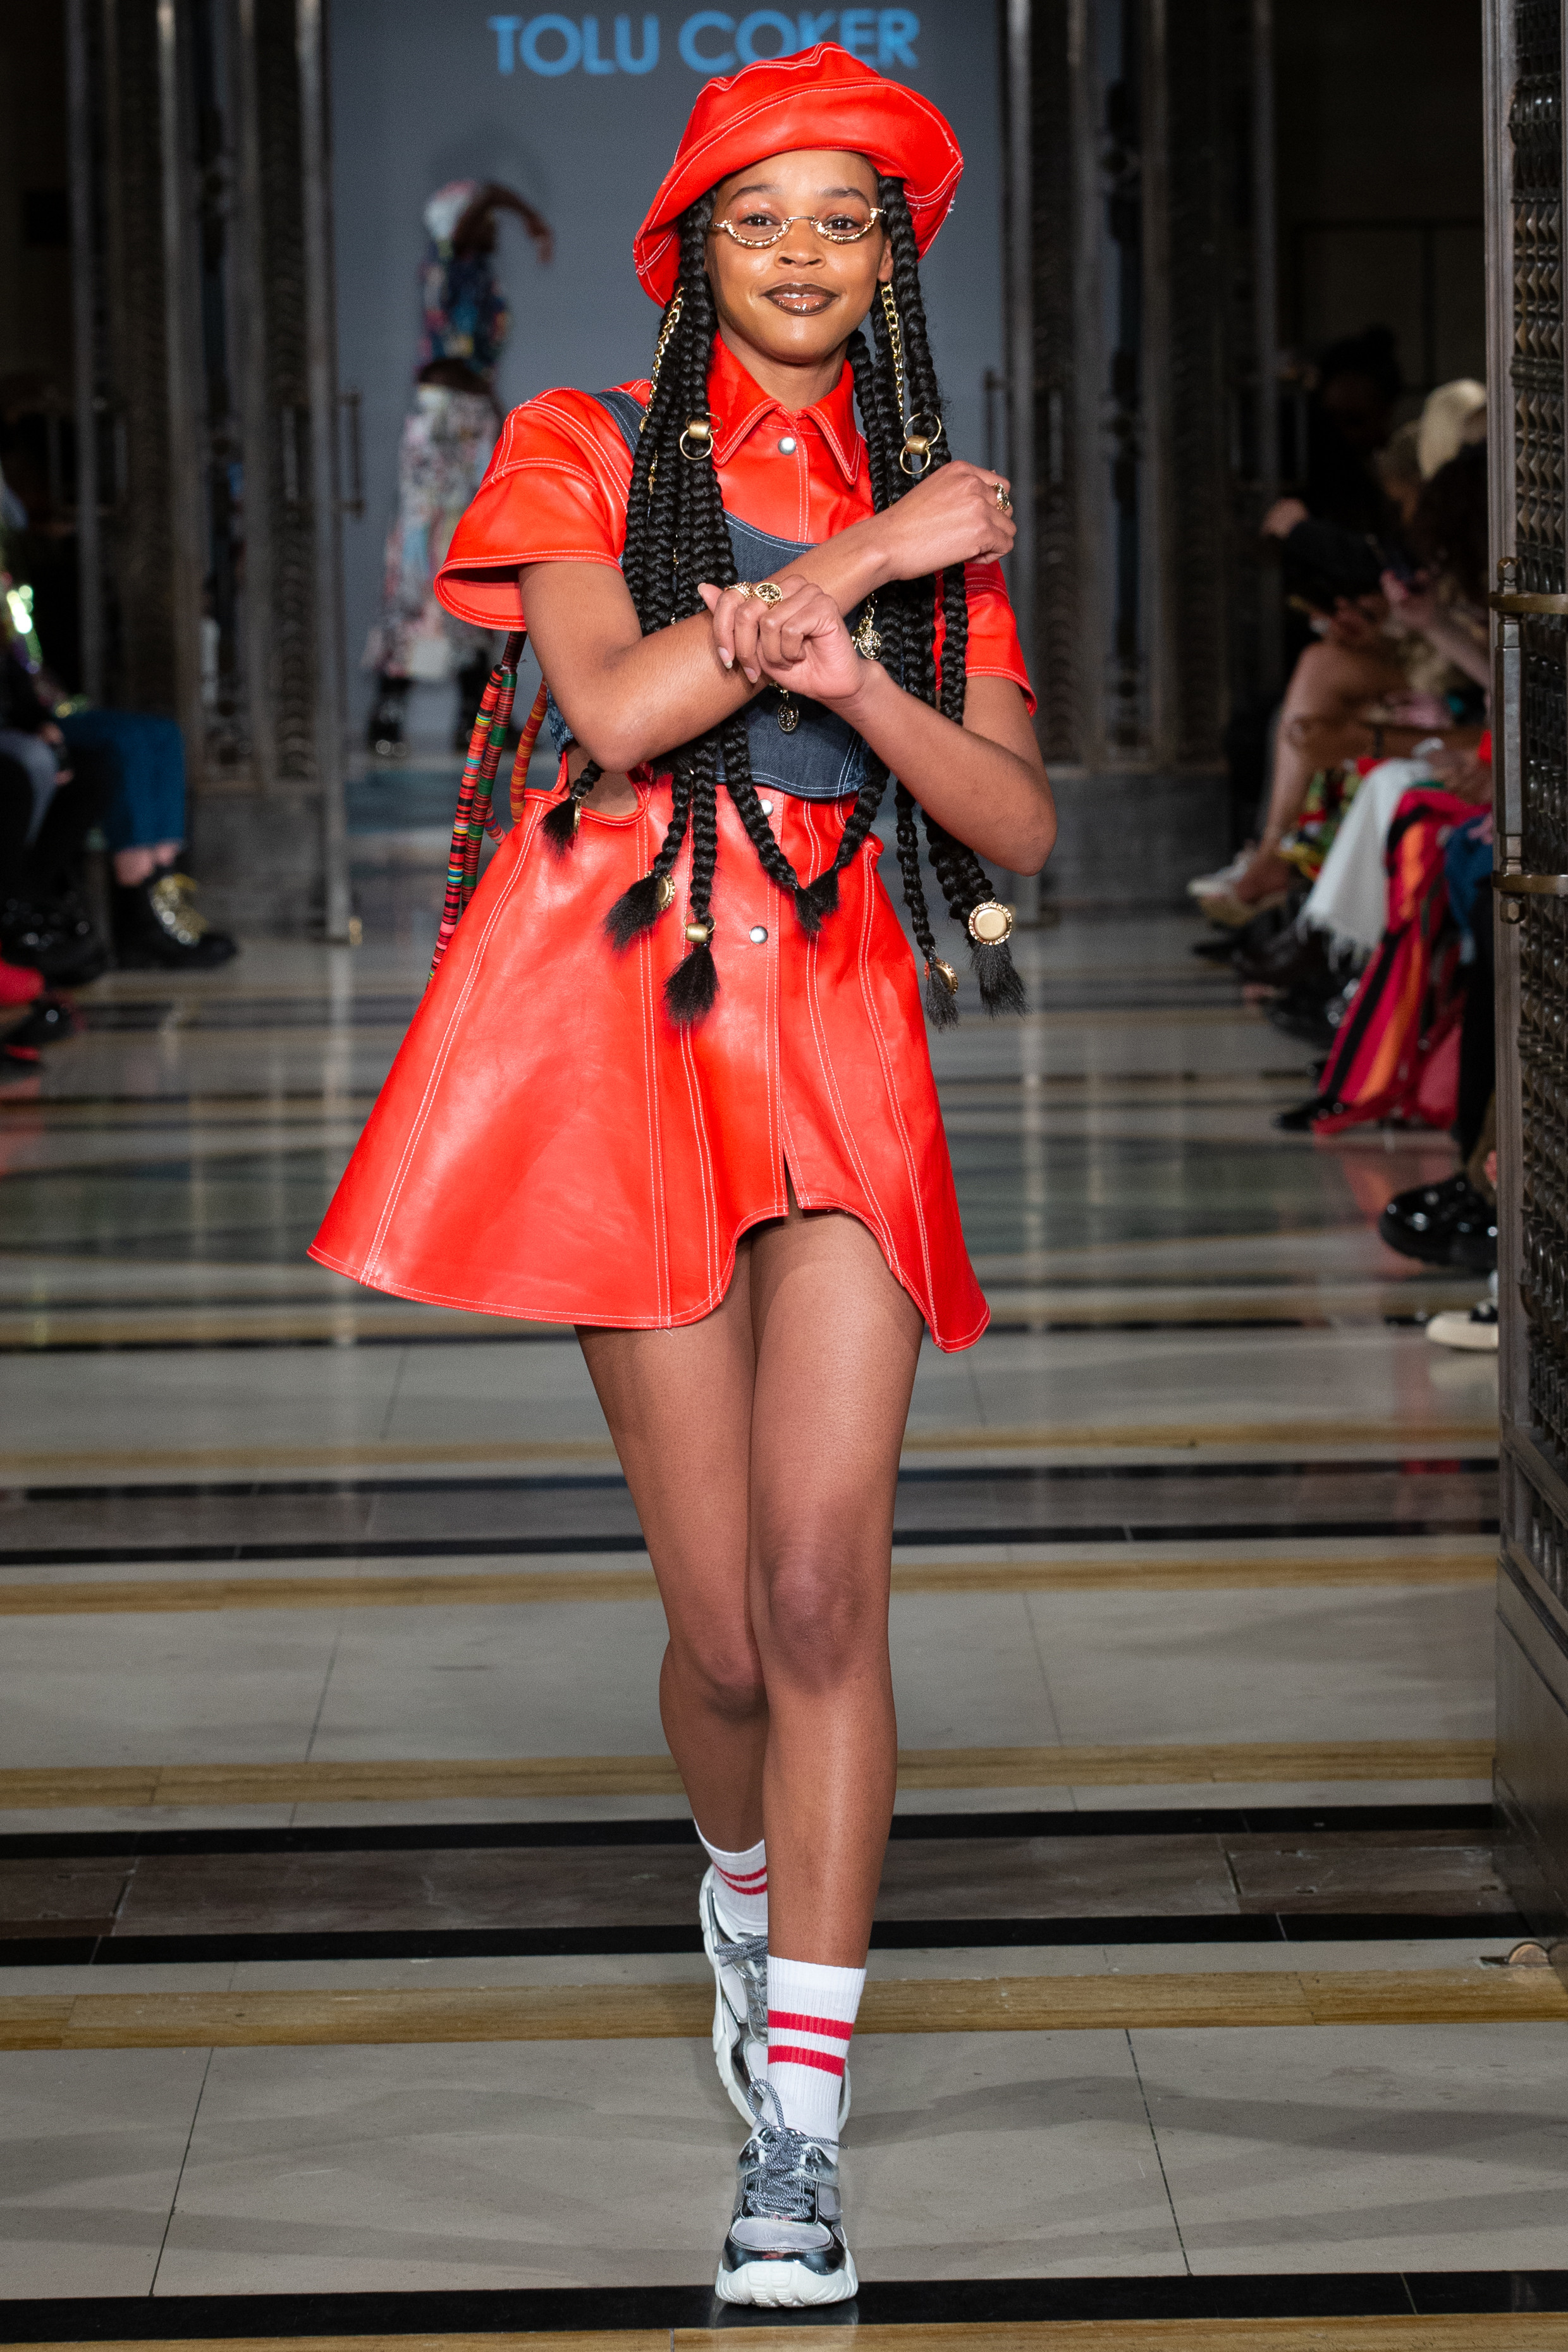 Nigerian Fashion Designer and Merit Award Winner Tolu Coker